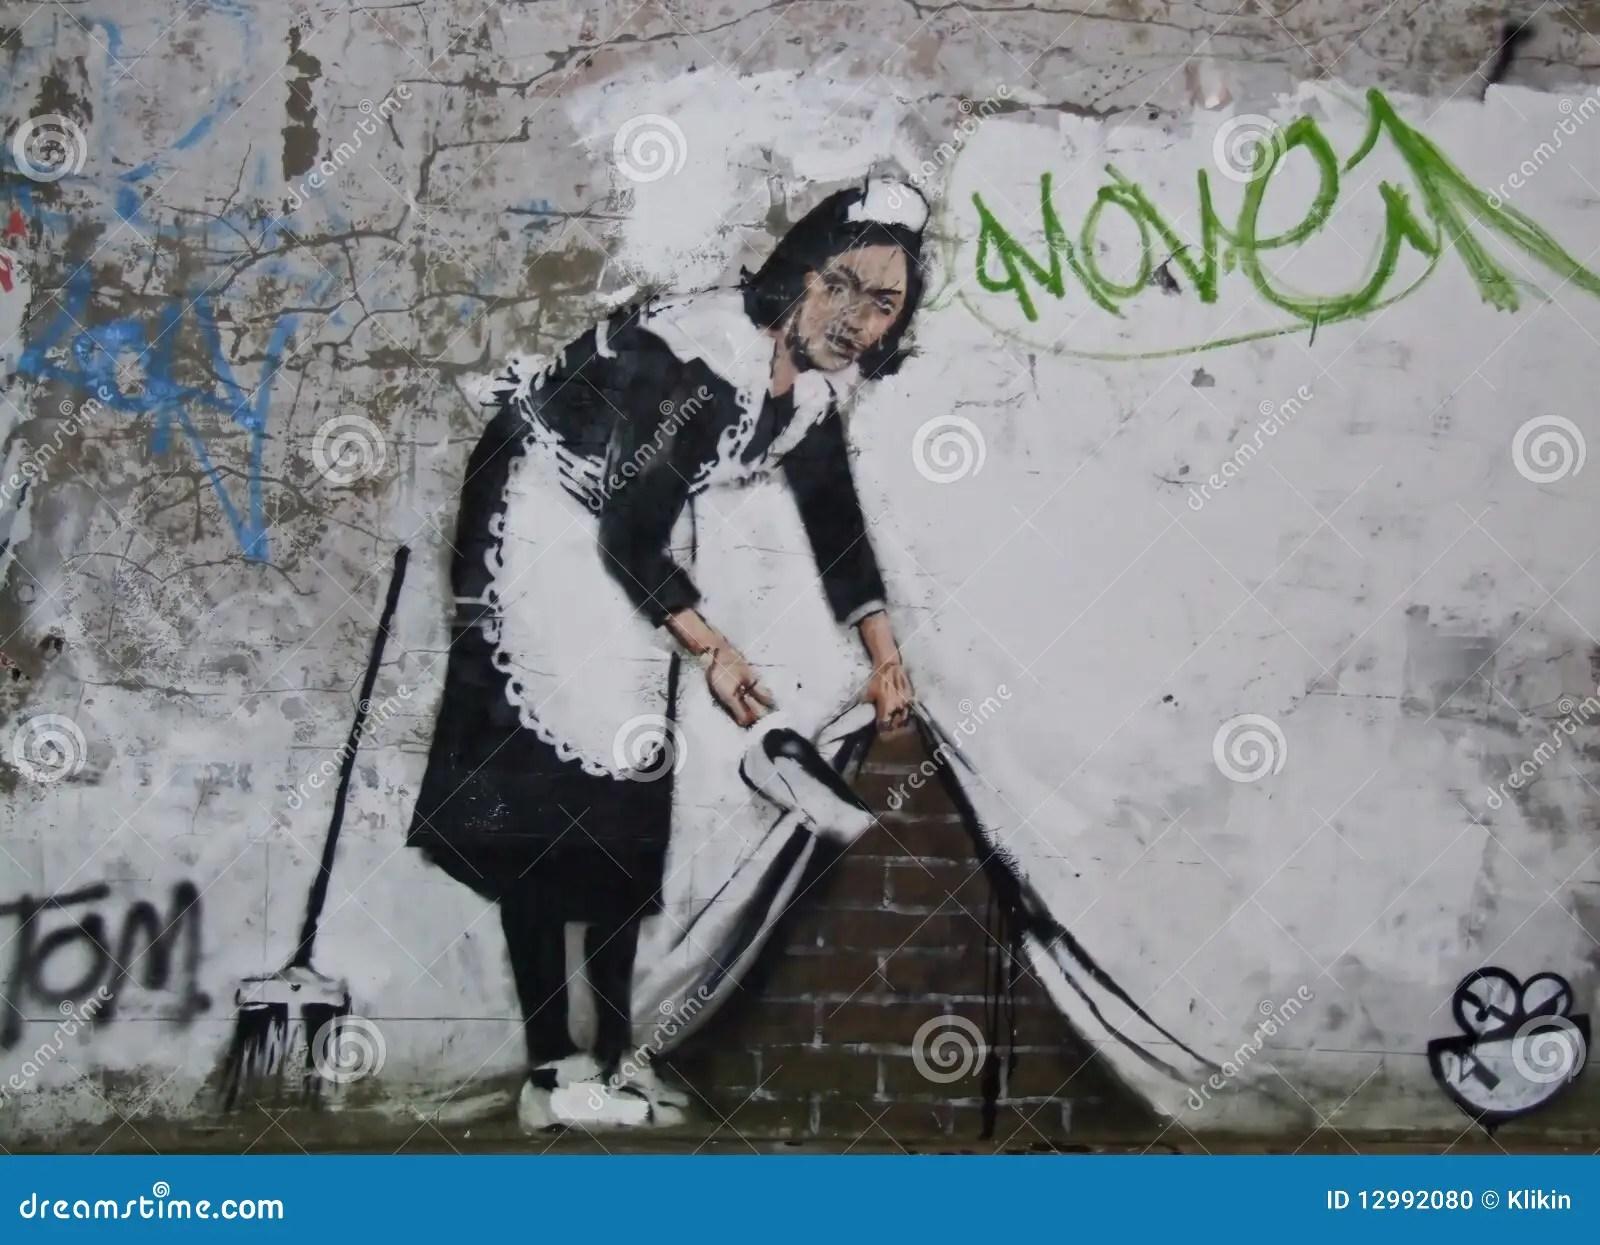 Banksy Chalk Farm Rd London Editorial Image Image